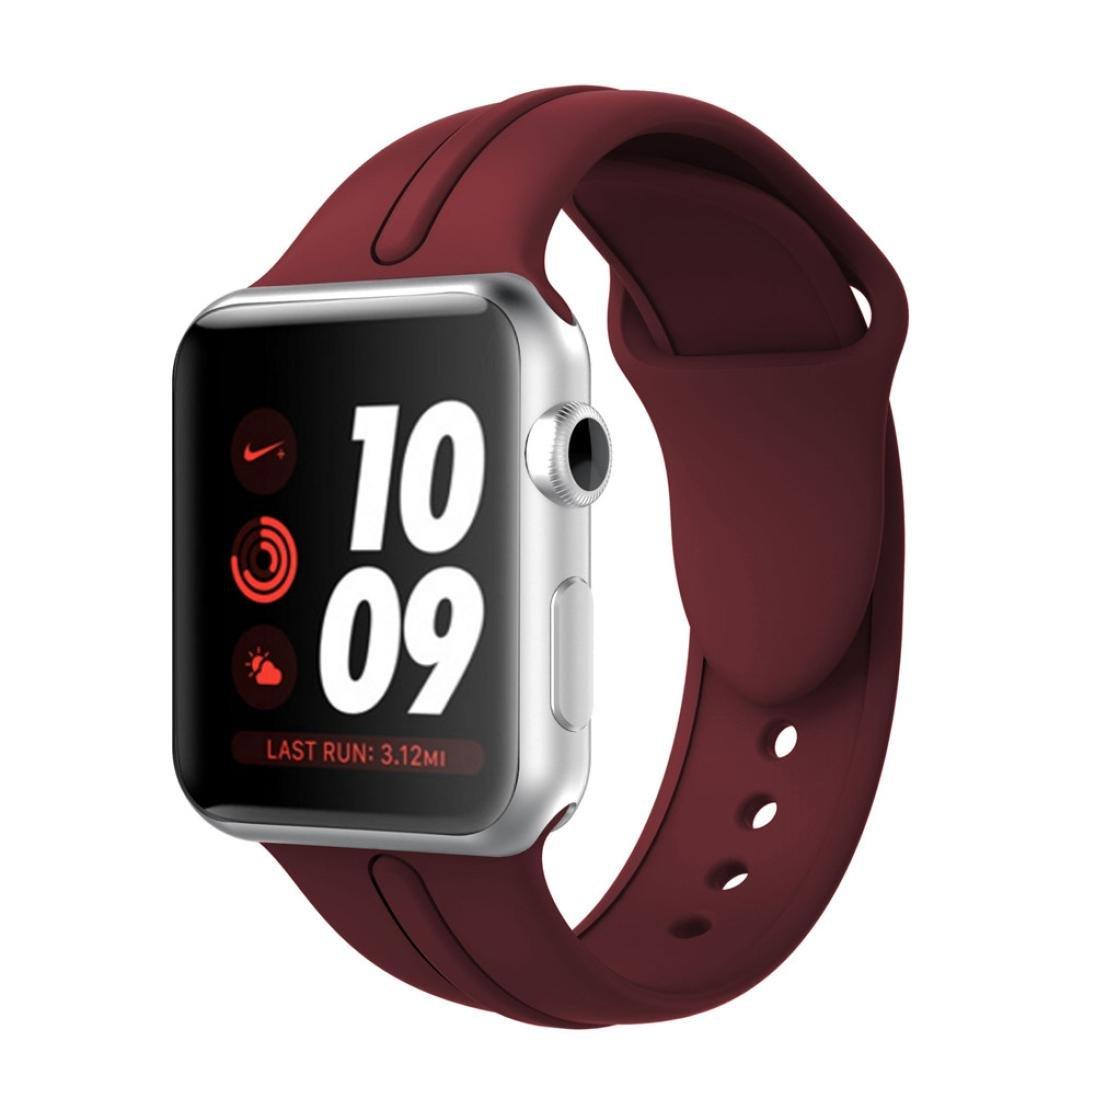 Sunfei For Apple Watch, New Fashion Sports Silicone Bracelet Strap Band New Fashion Sports Silicone Bracelet Strap Band for Apple Watch Series 3/2/1 (42MM, Wine)